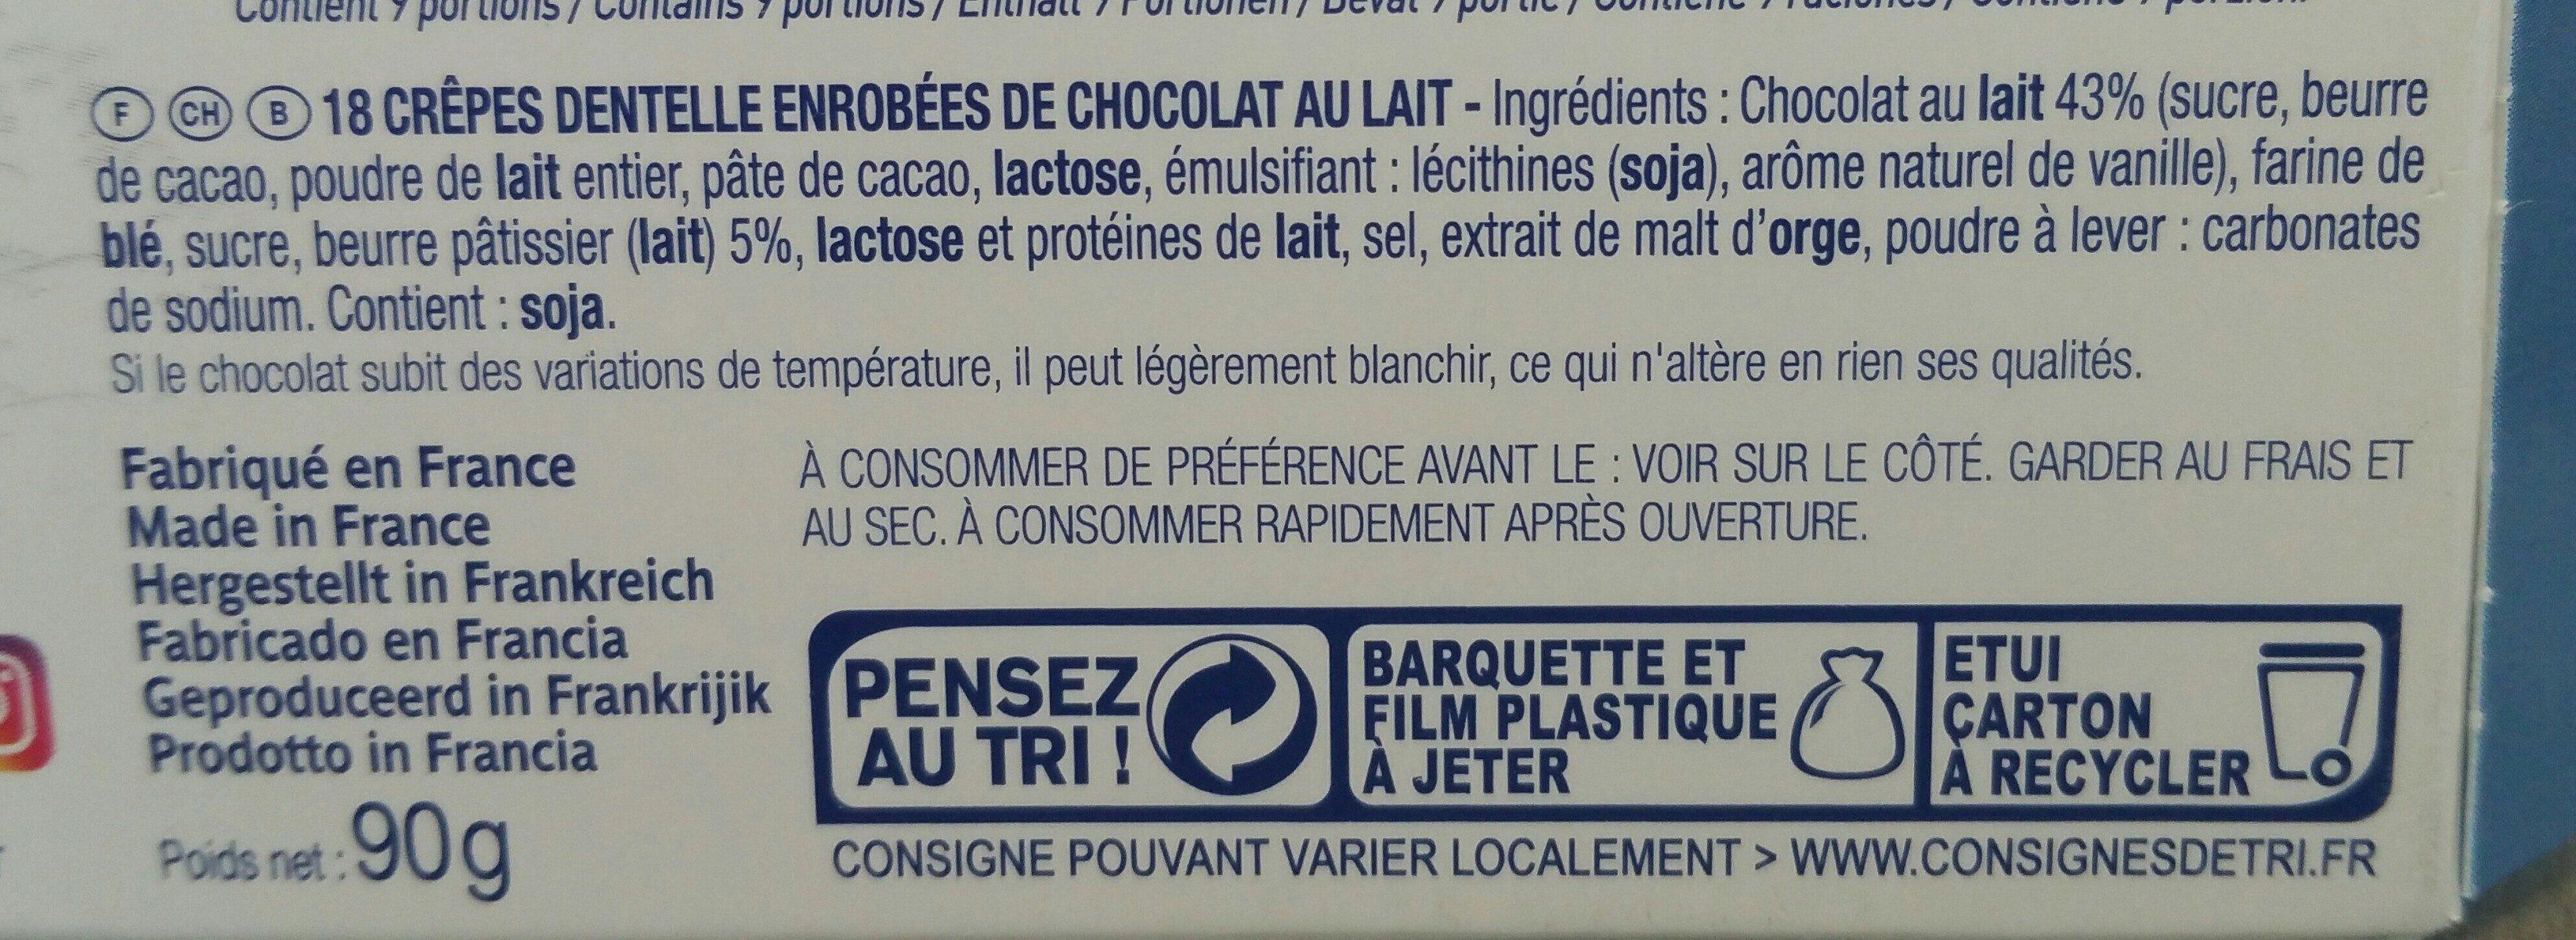 CRÊPES DENTELLE CHOCOLAT AU LAIT 90g - Ingredients - fr